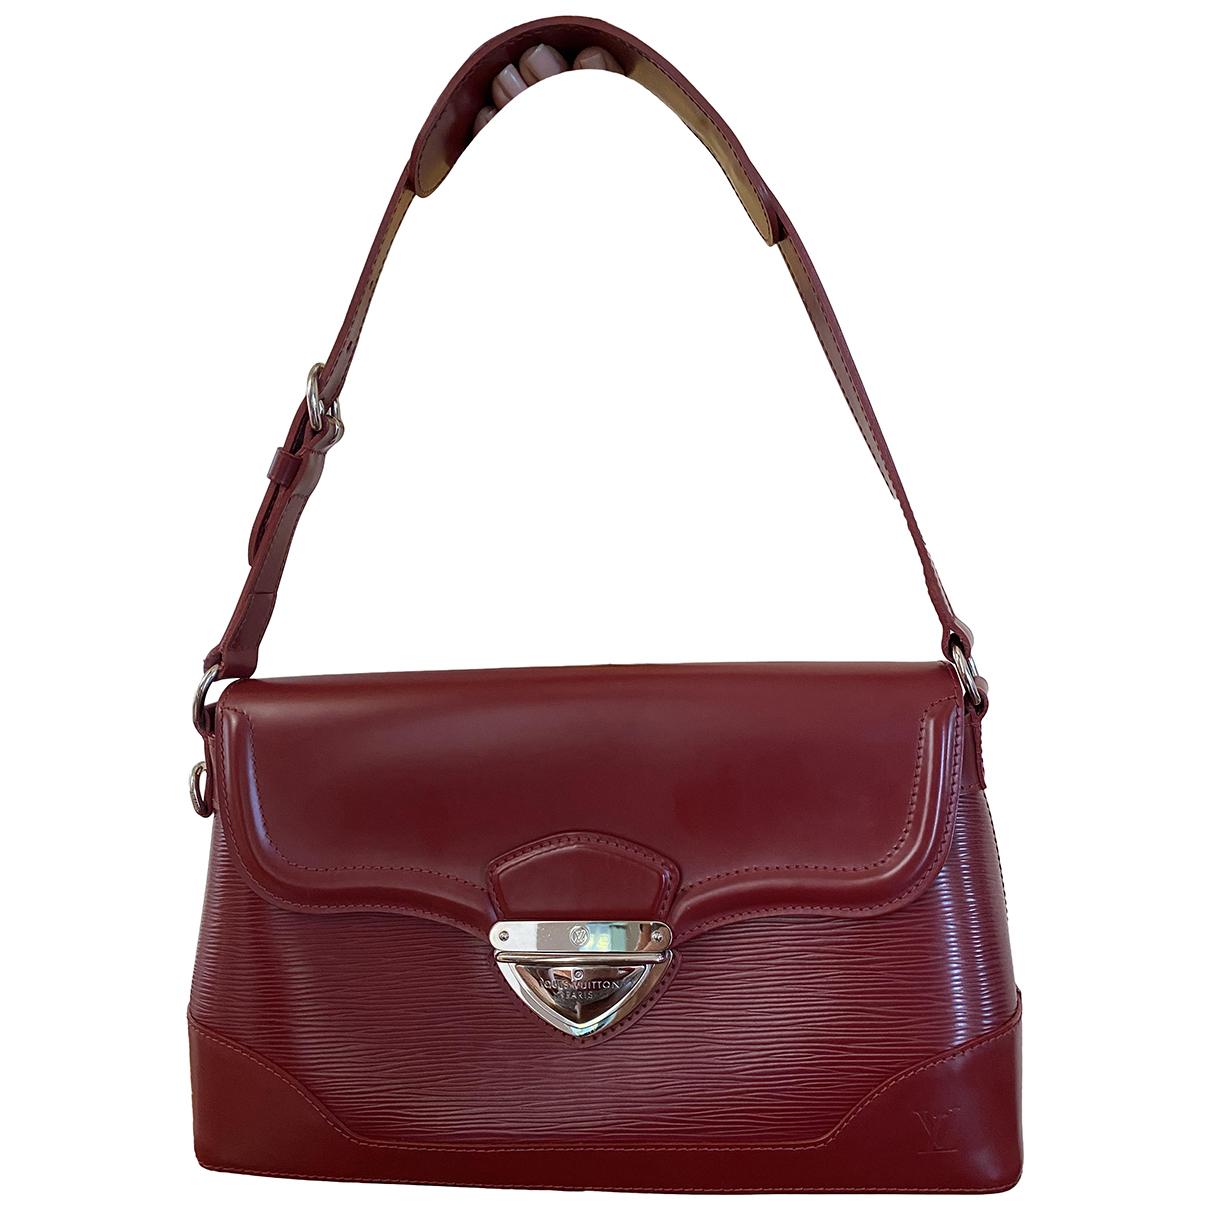 Louis Vuitton \N Handtasche in  Bordeauxrot Leder